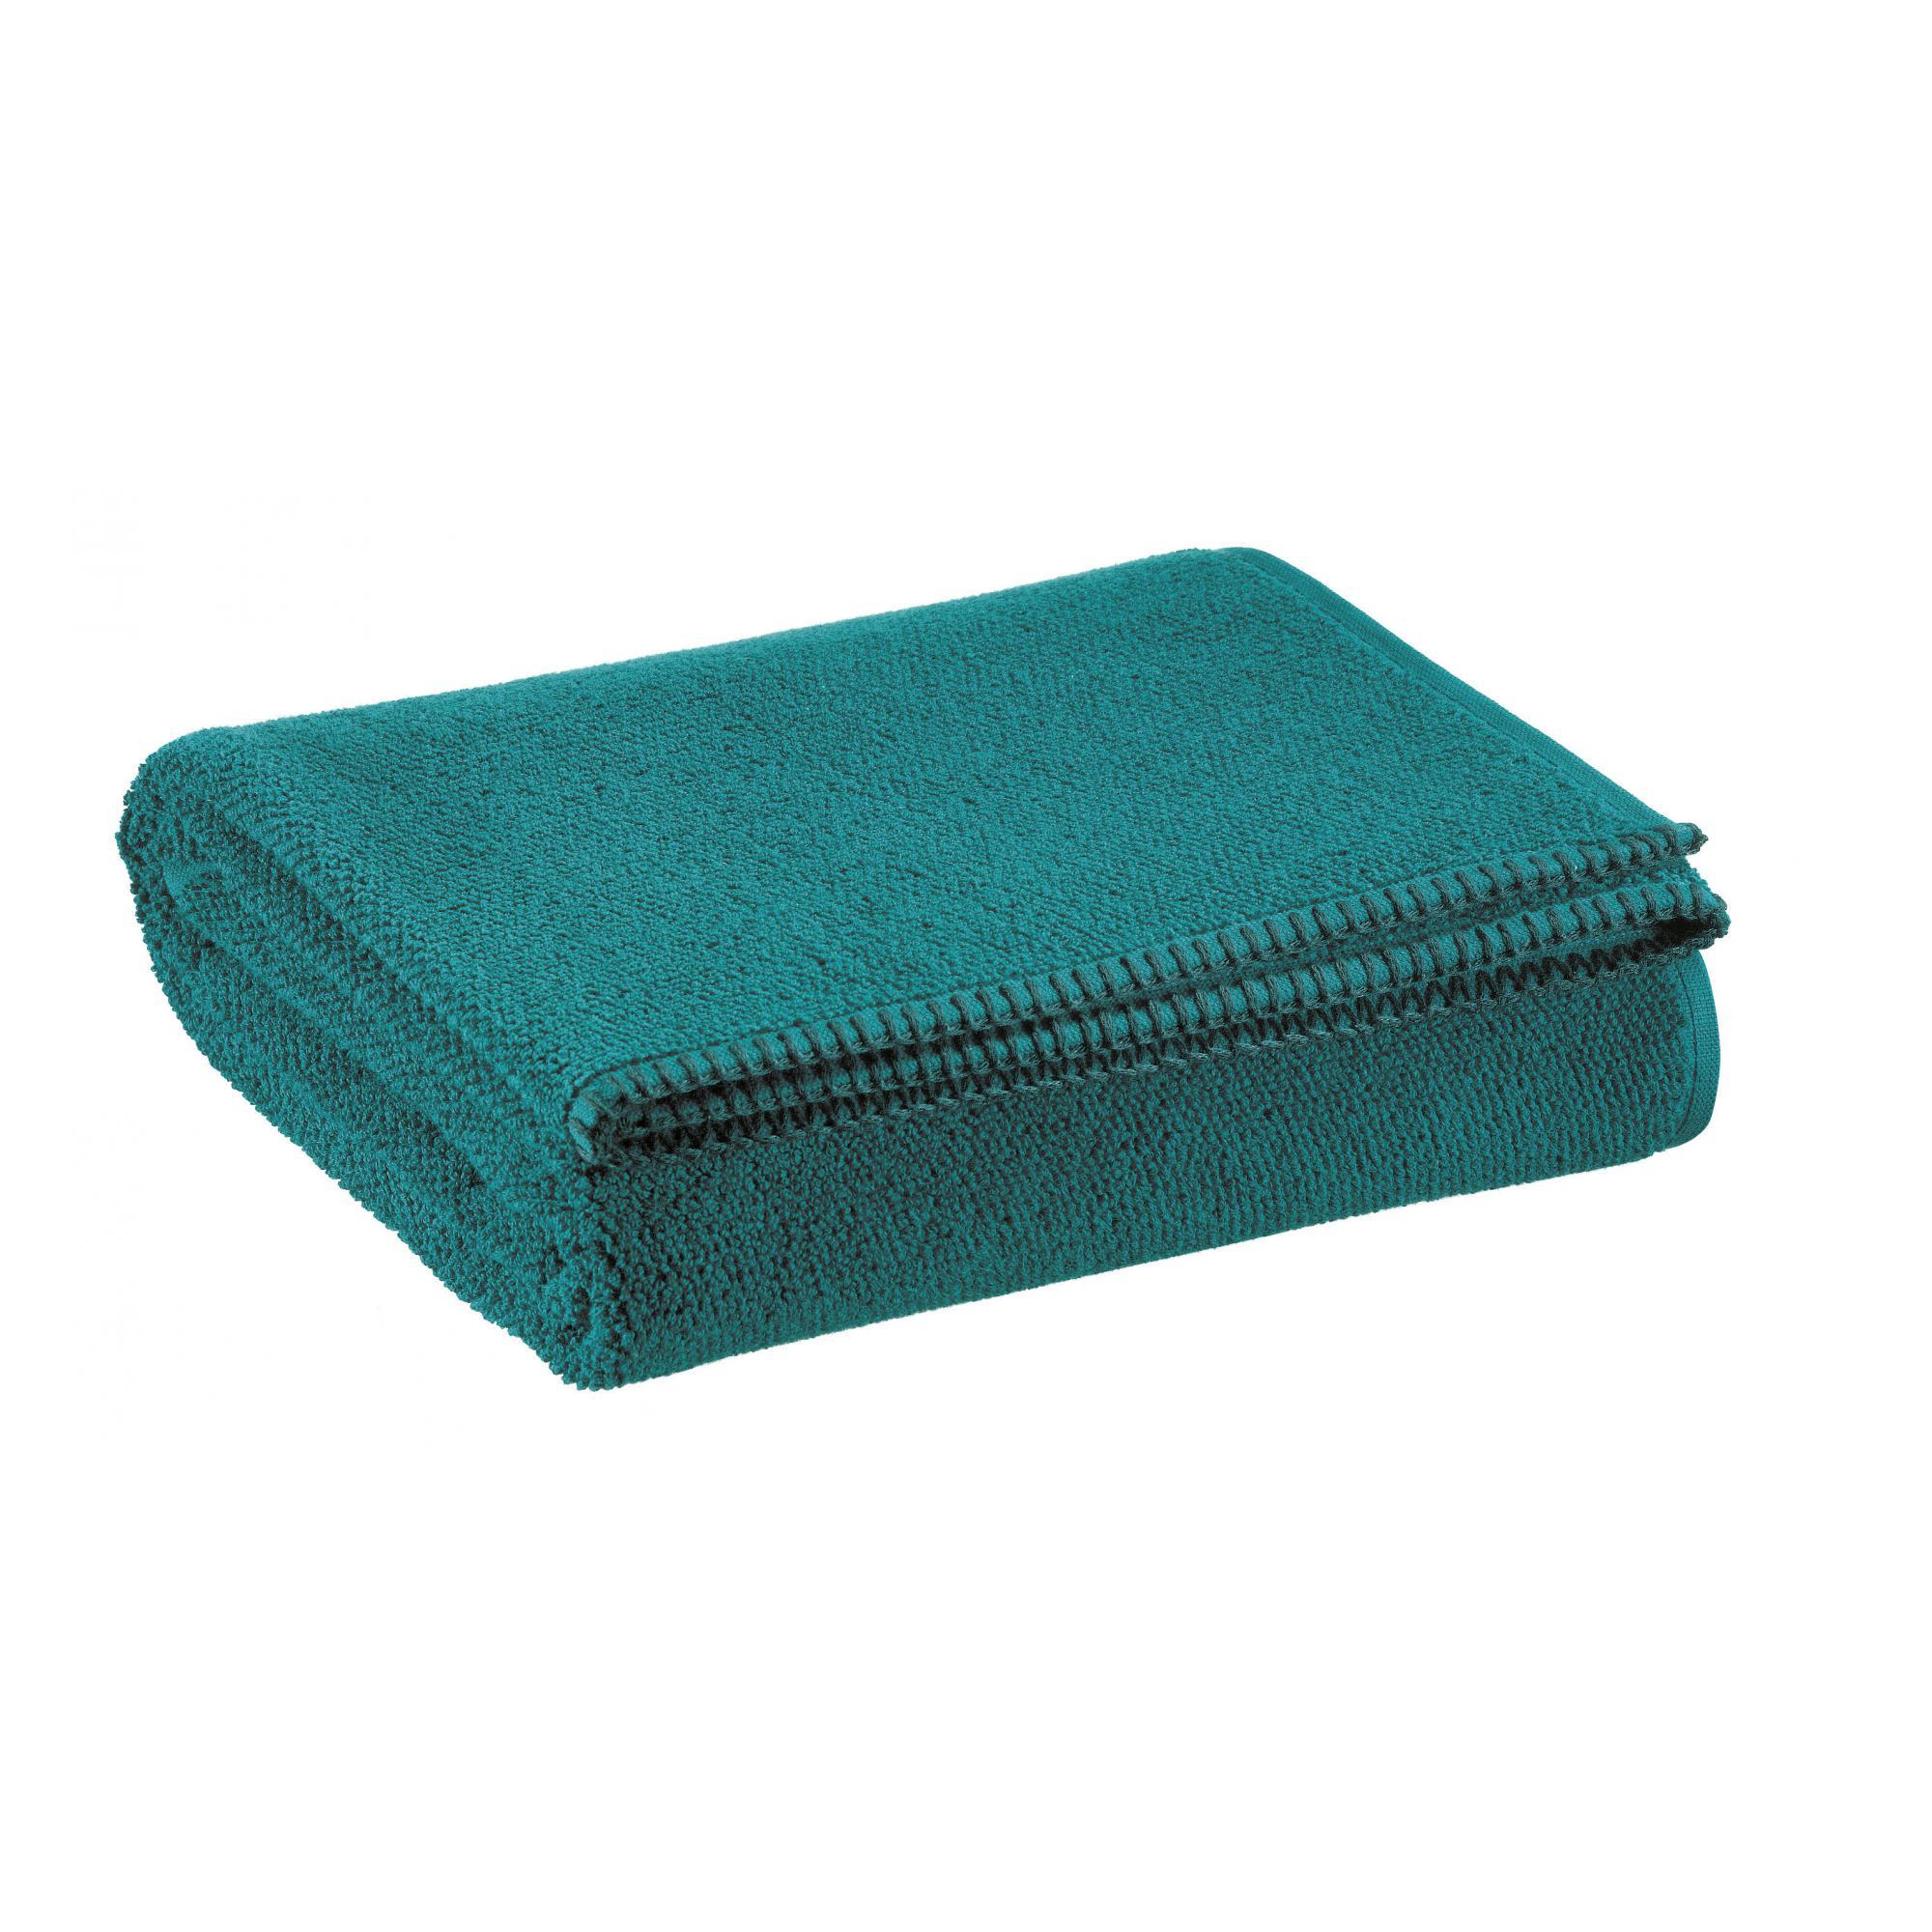 Drap de douche en coton paon 70 x 130